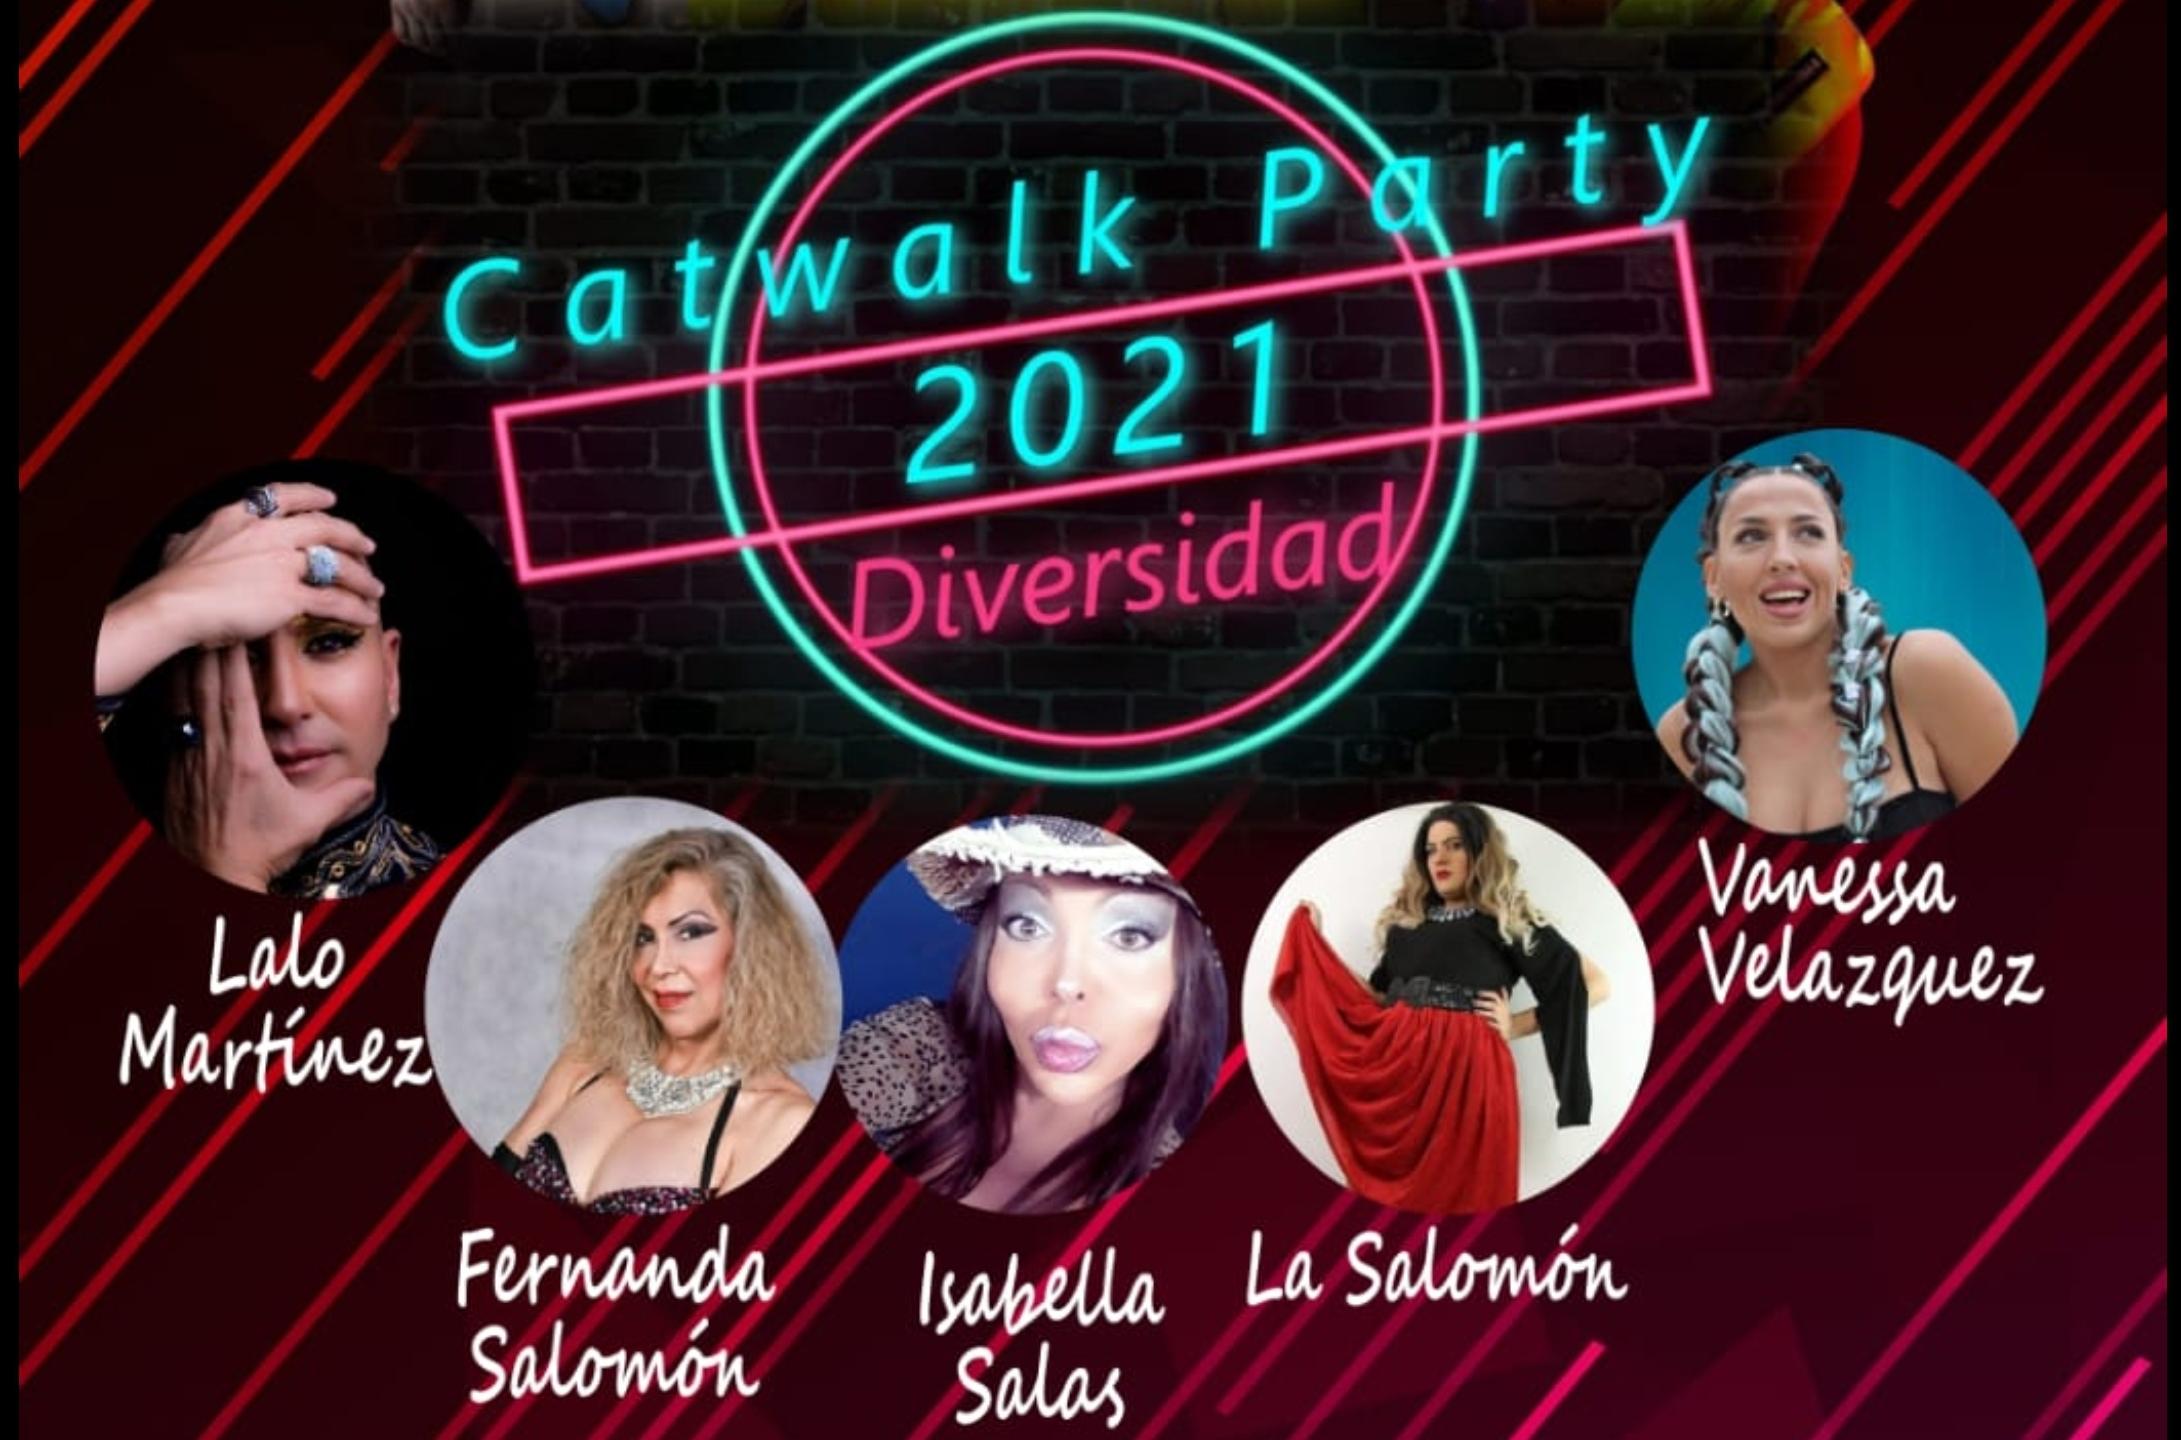 Catwalk Party Diversidad 2021